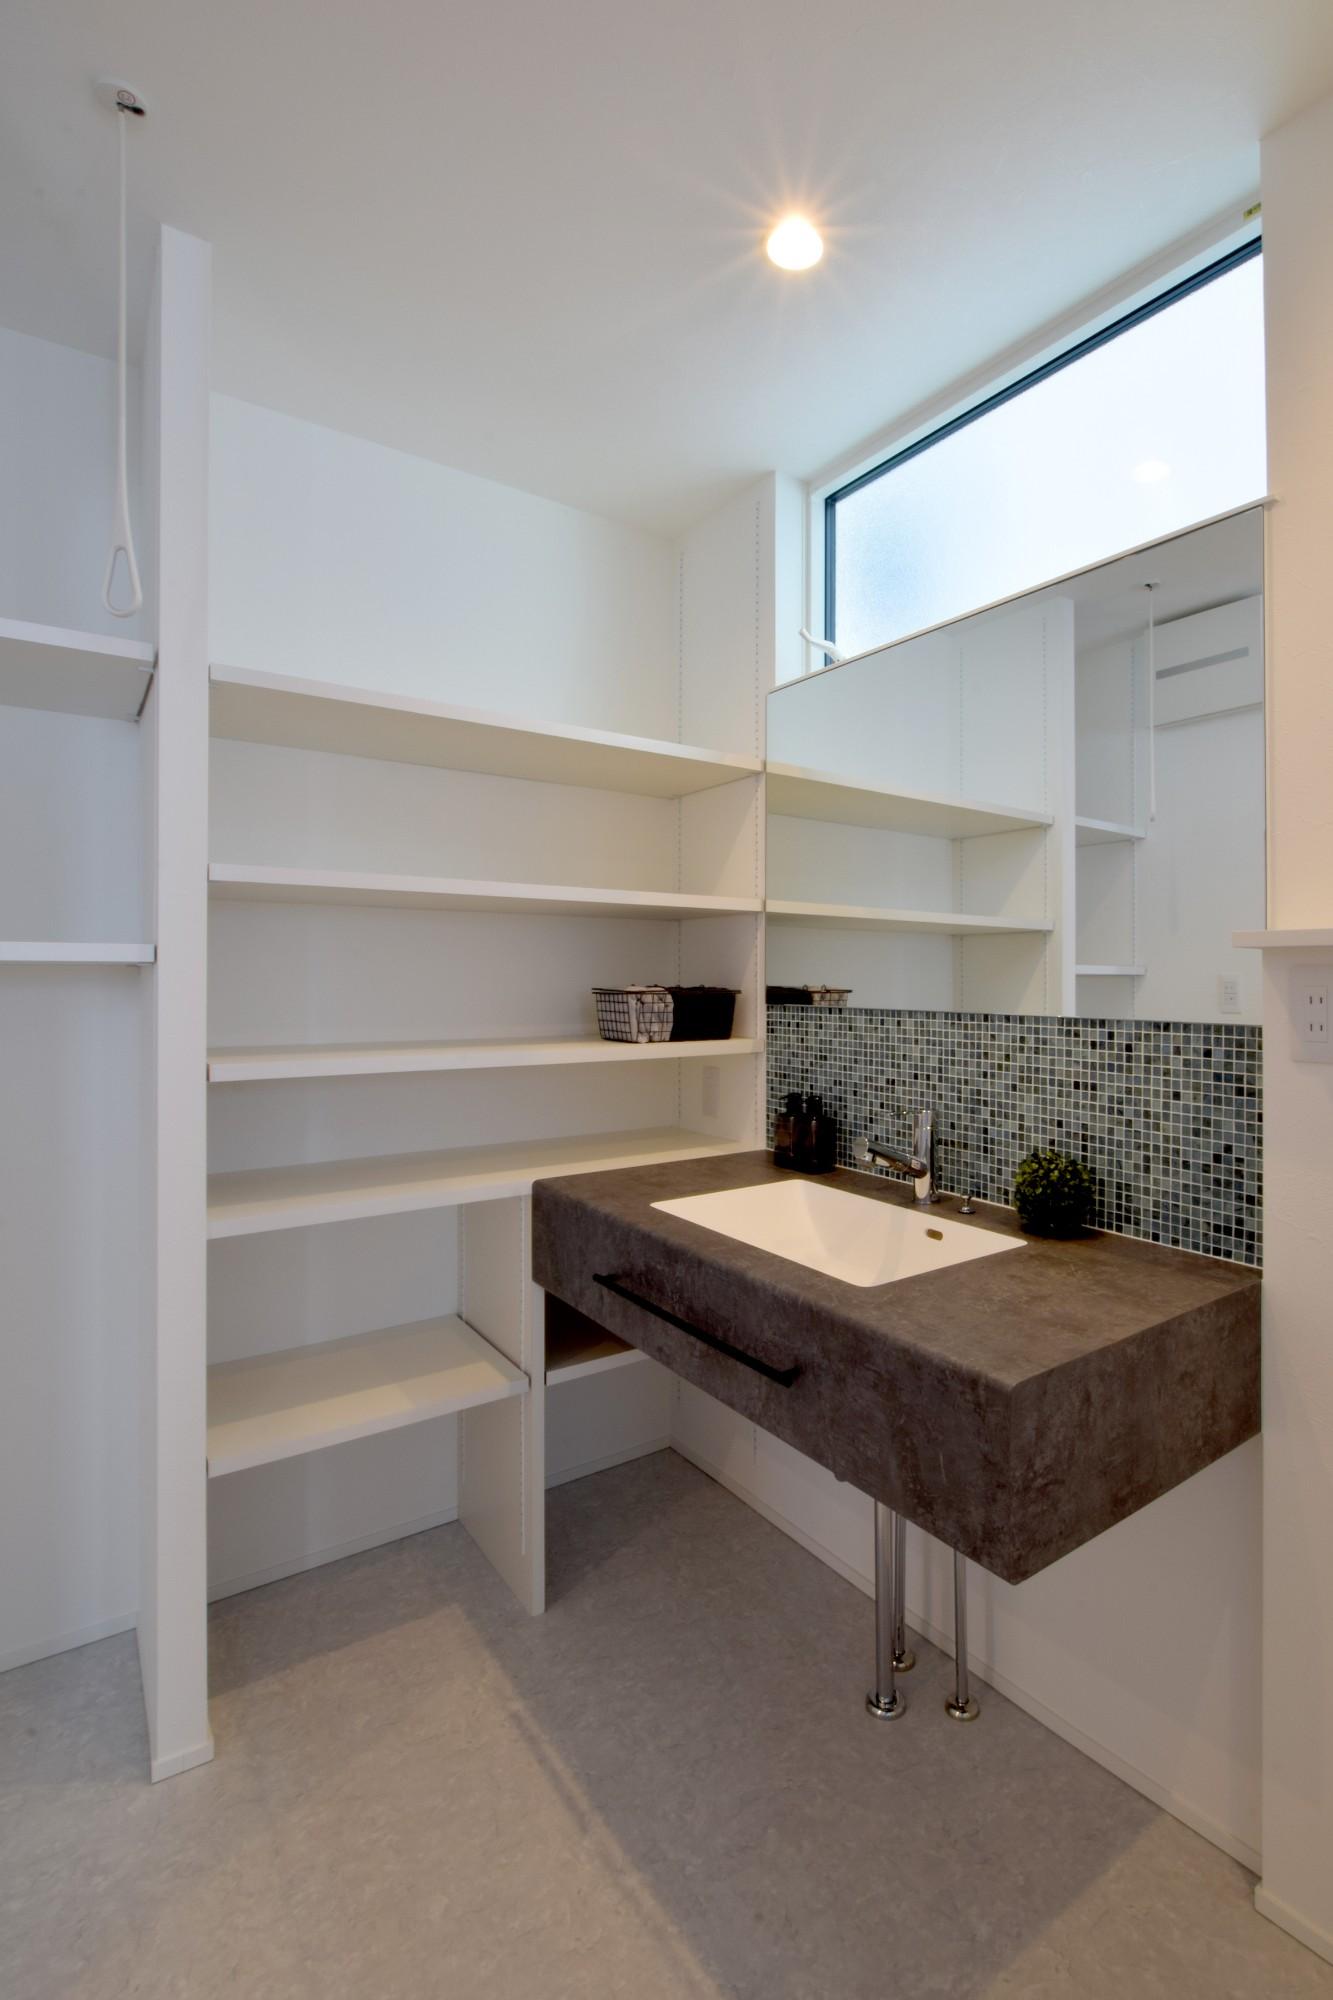 DETAIL HOME(ディテールホーム)「おうち時間を大切にした住まい」のシンプル・ナチュラルな洗面所・脱衣所の実例写真